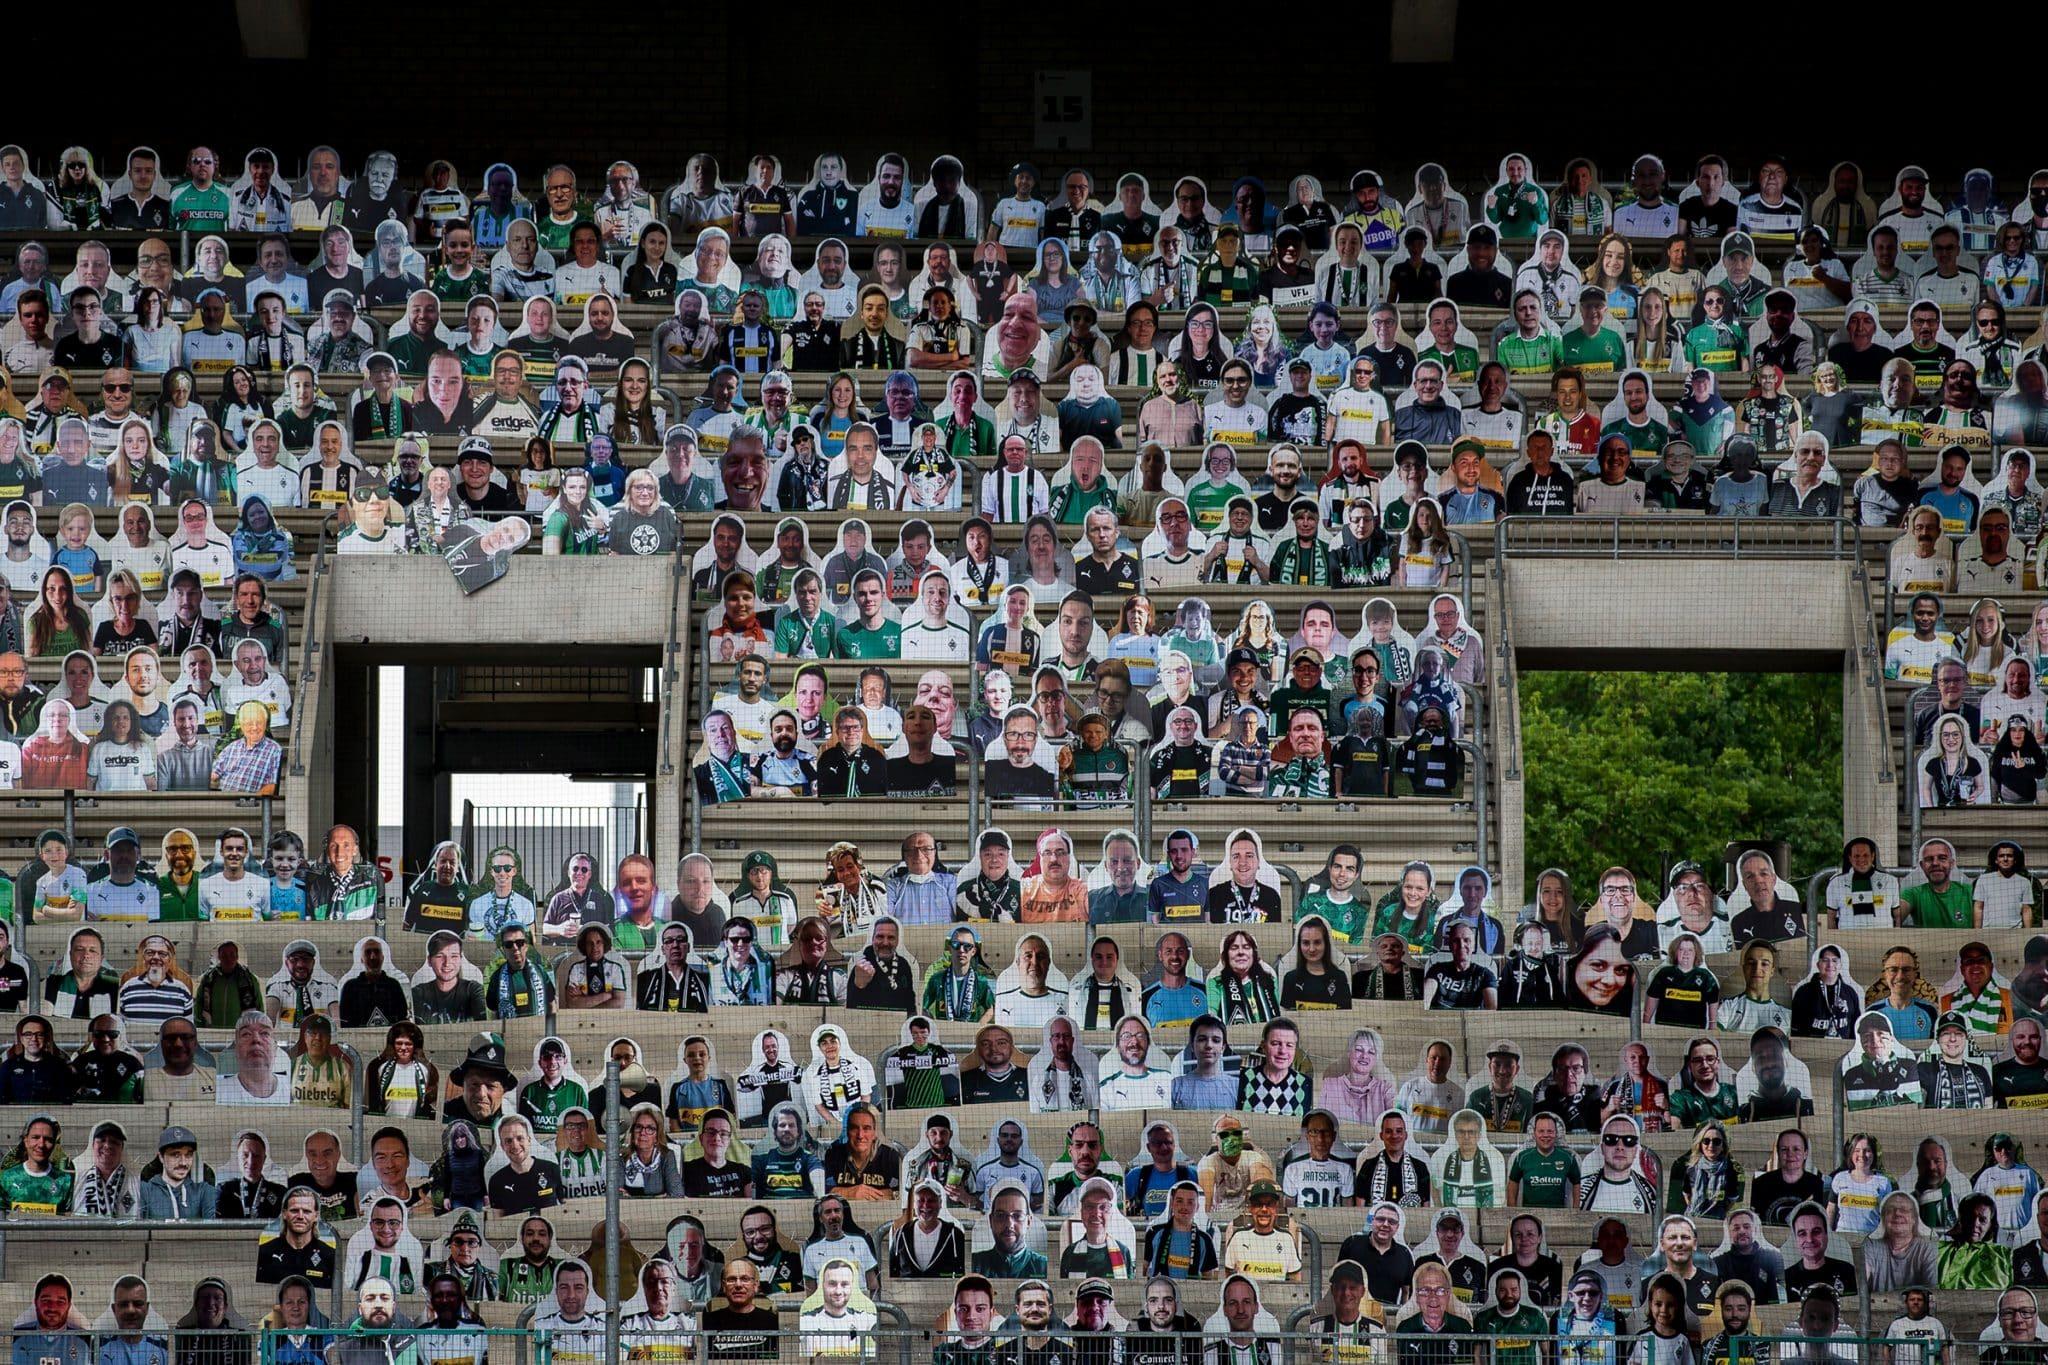 germany-stadium-borussia-monchengladbach-scaled-e1590337795482.jpg